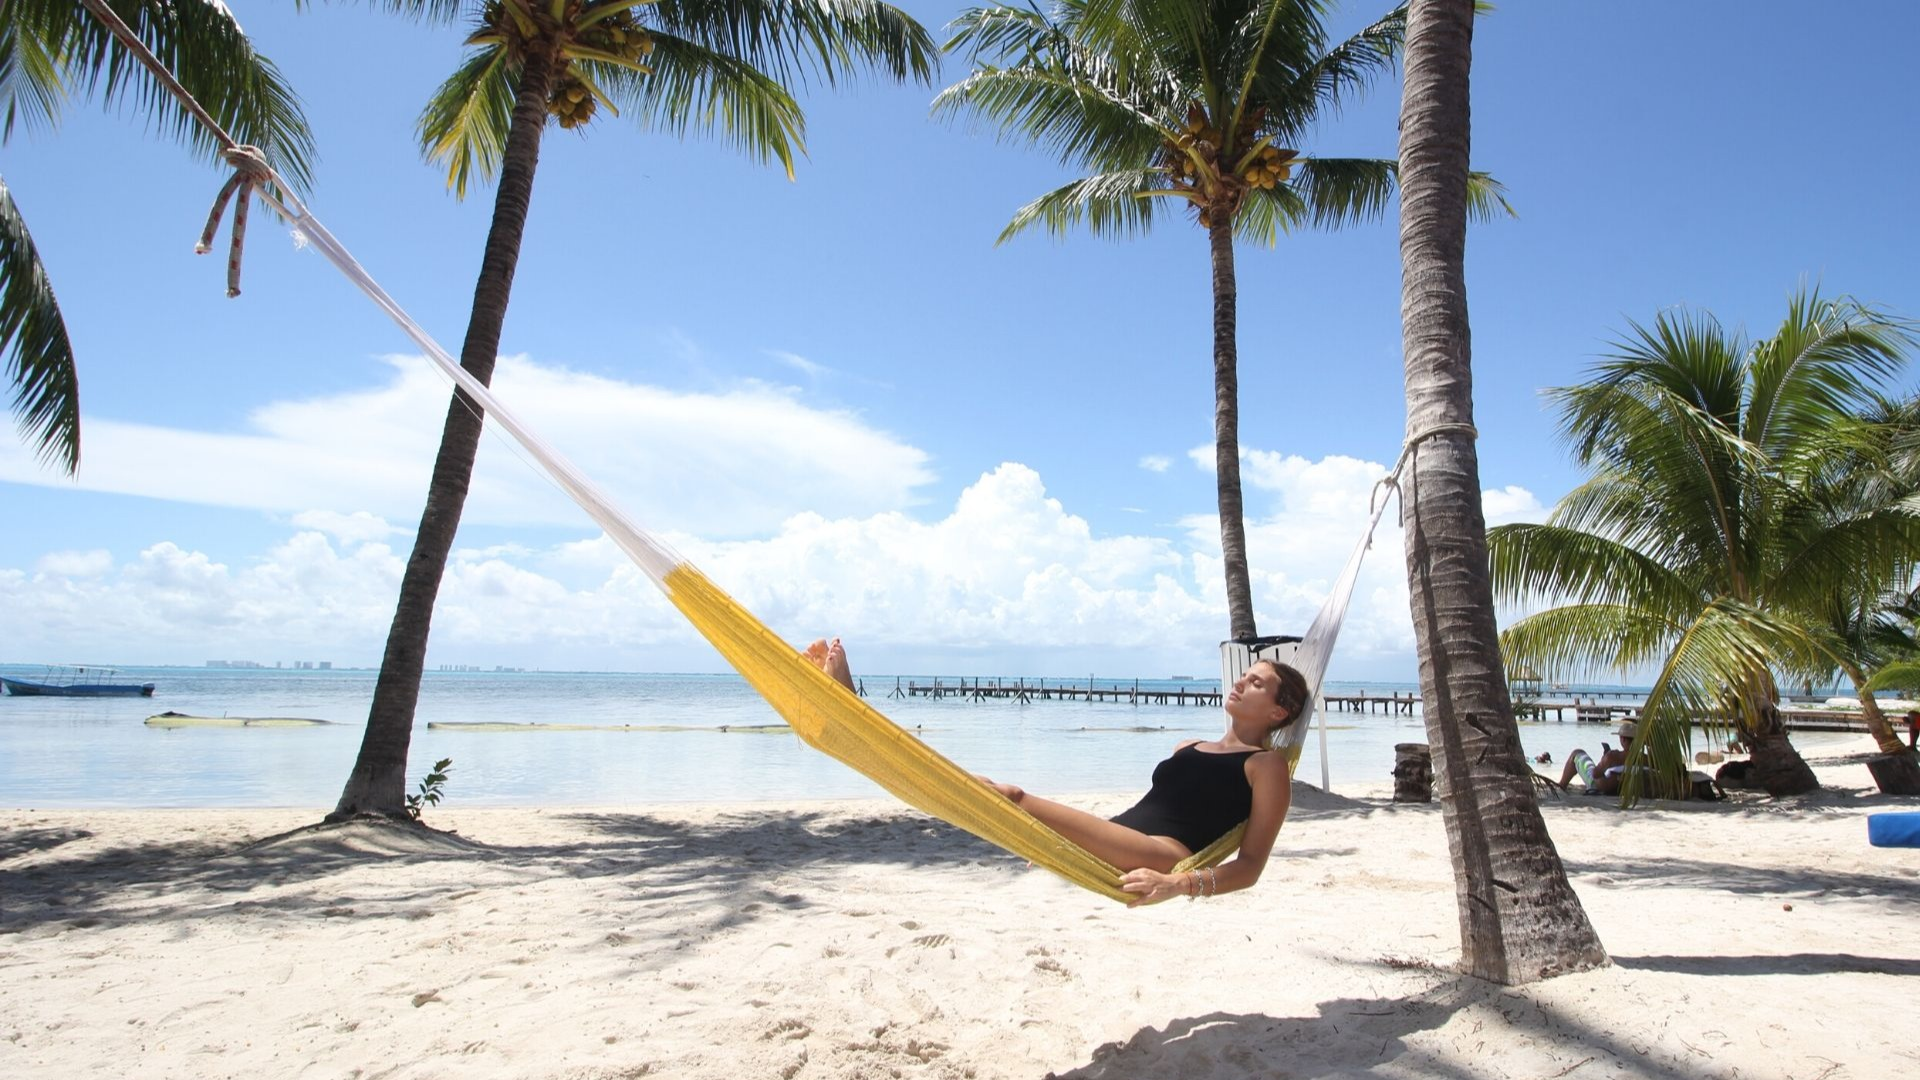 04 - Beach club - Playa Mexico - Ice Bar Isla Mujeres - Beach hammock